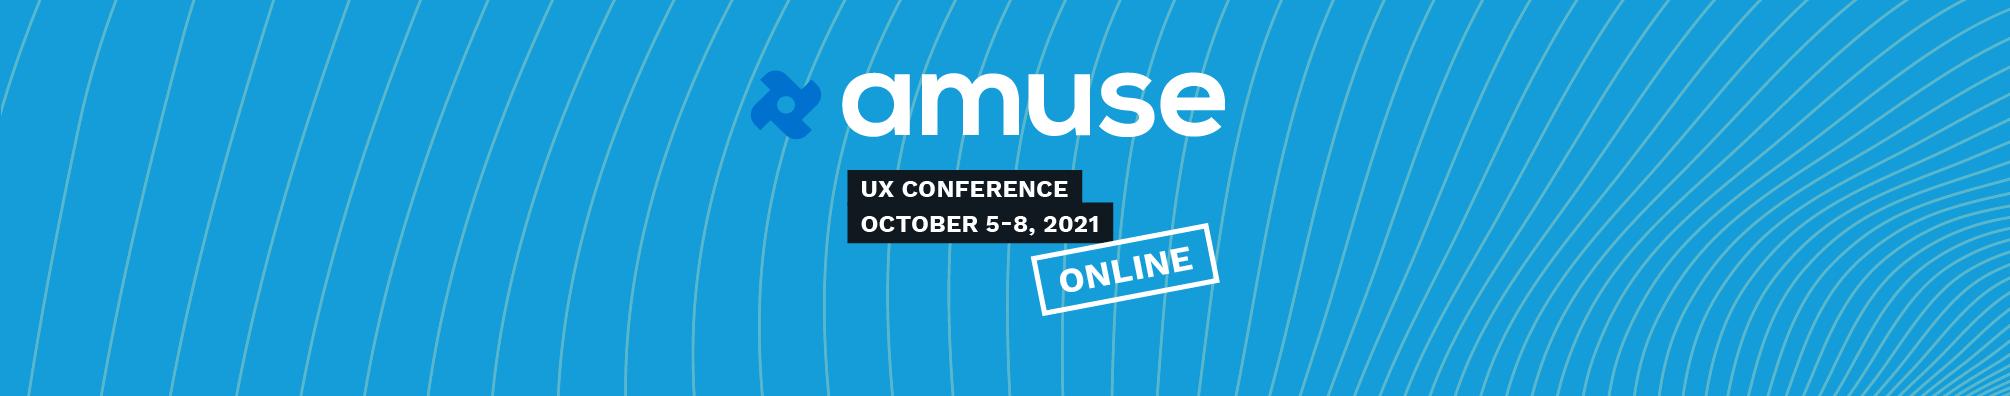 Amuse Conference 2021